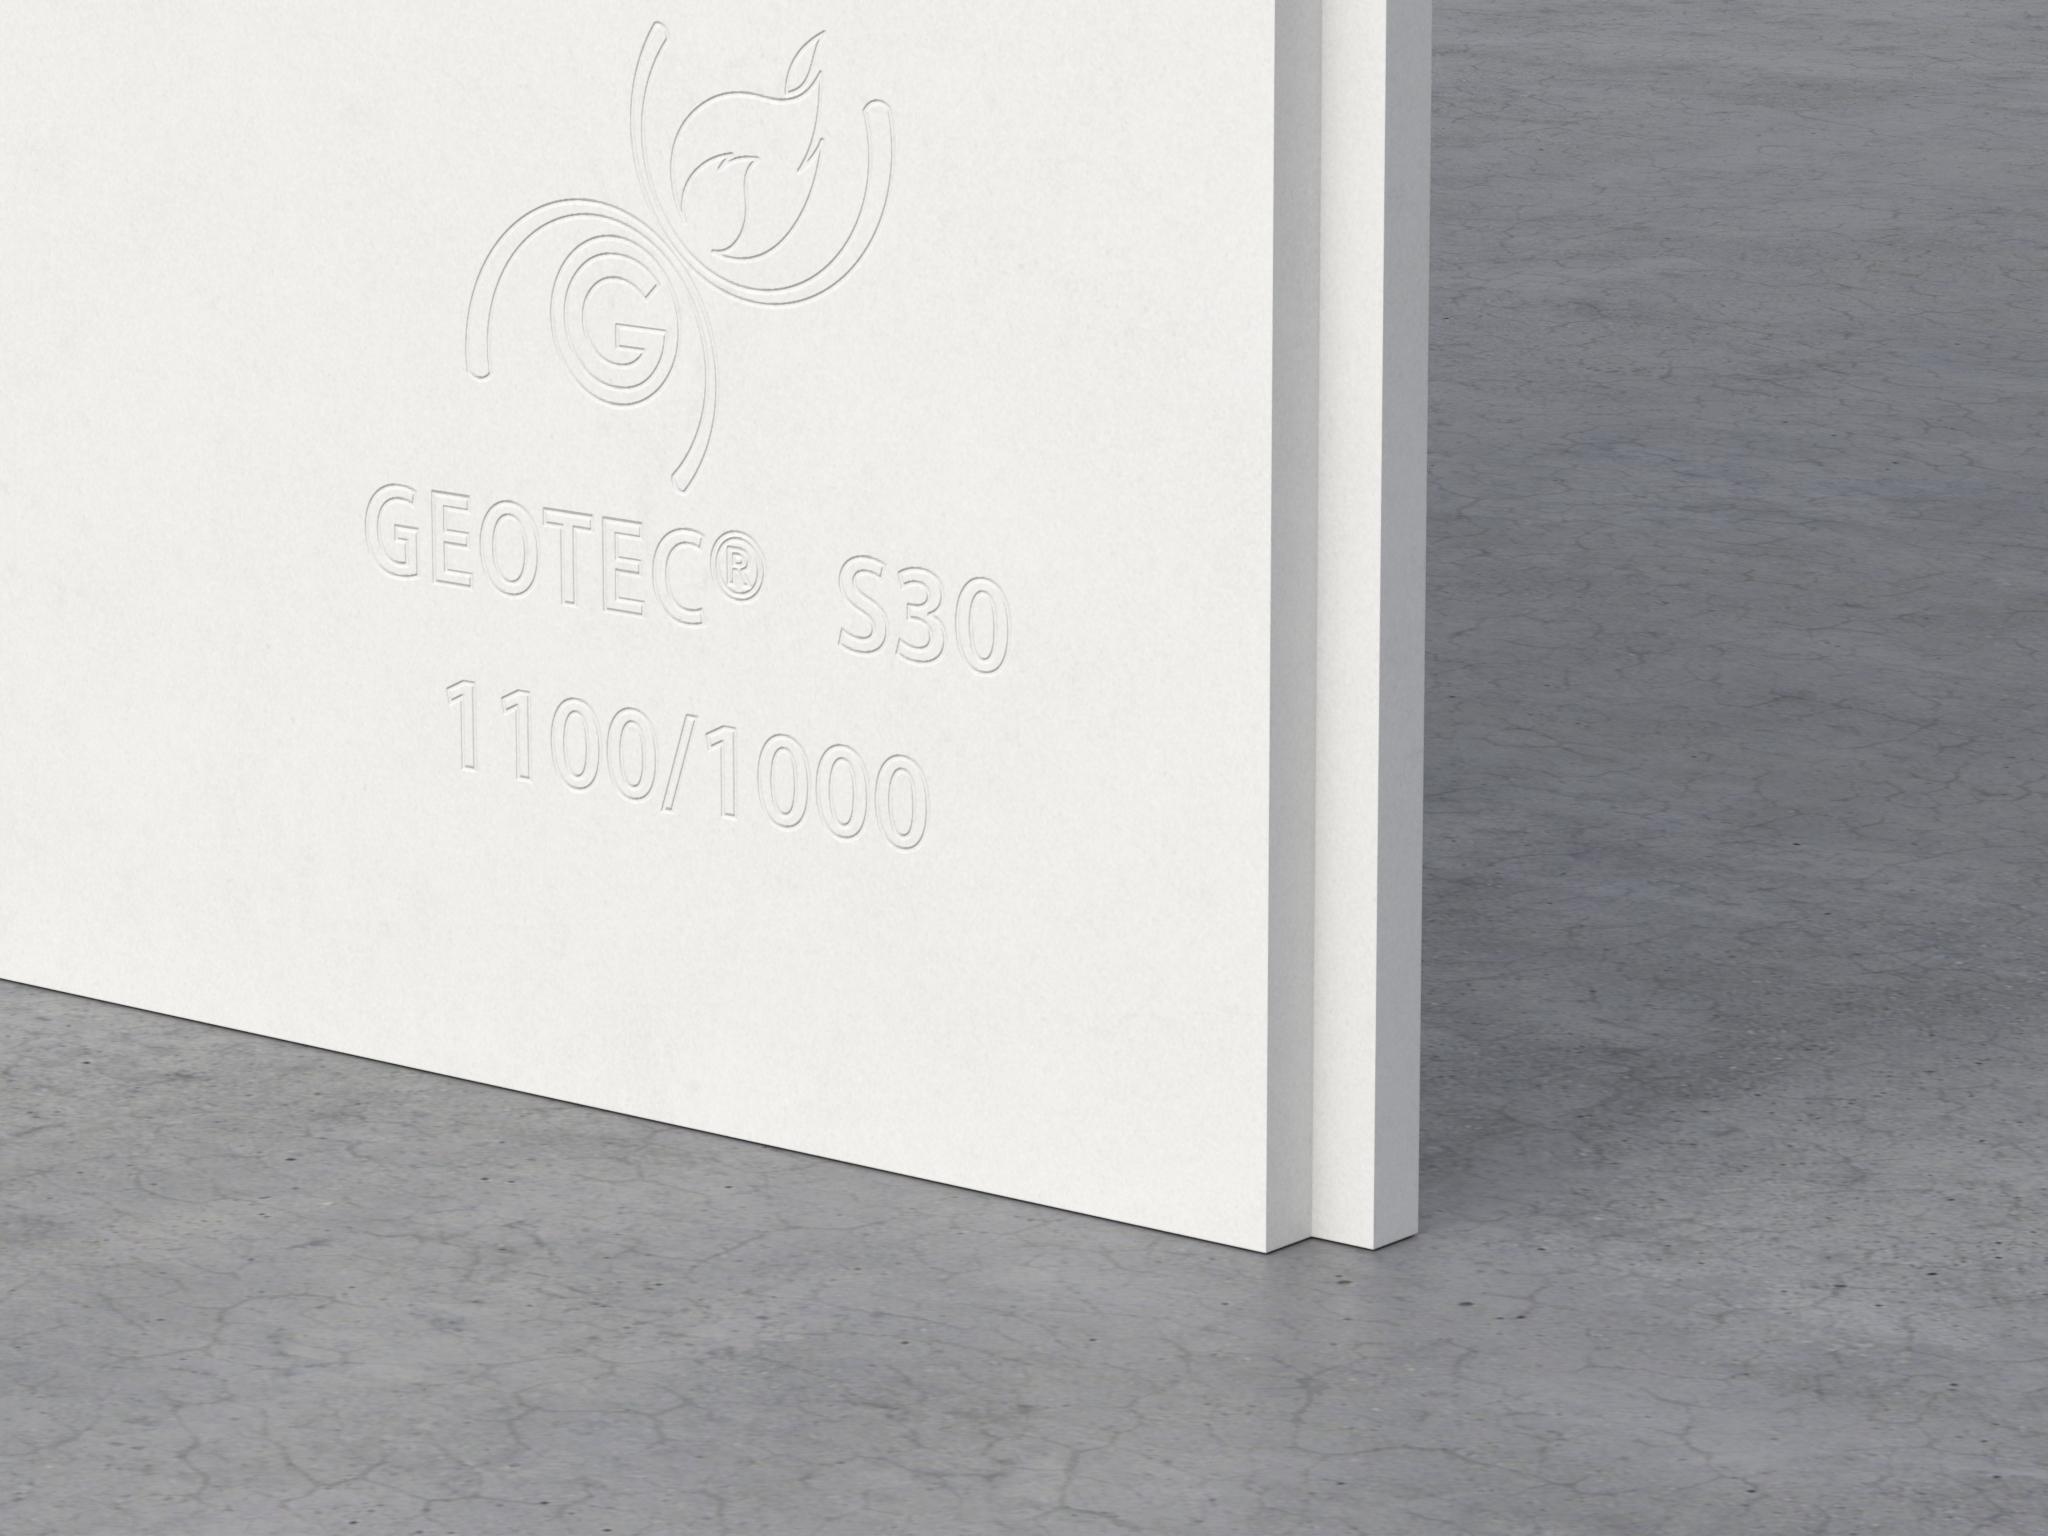 Plaque GEOTEC® S30 Geostaff